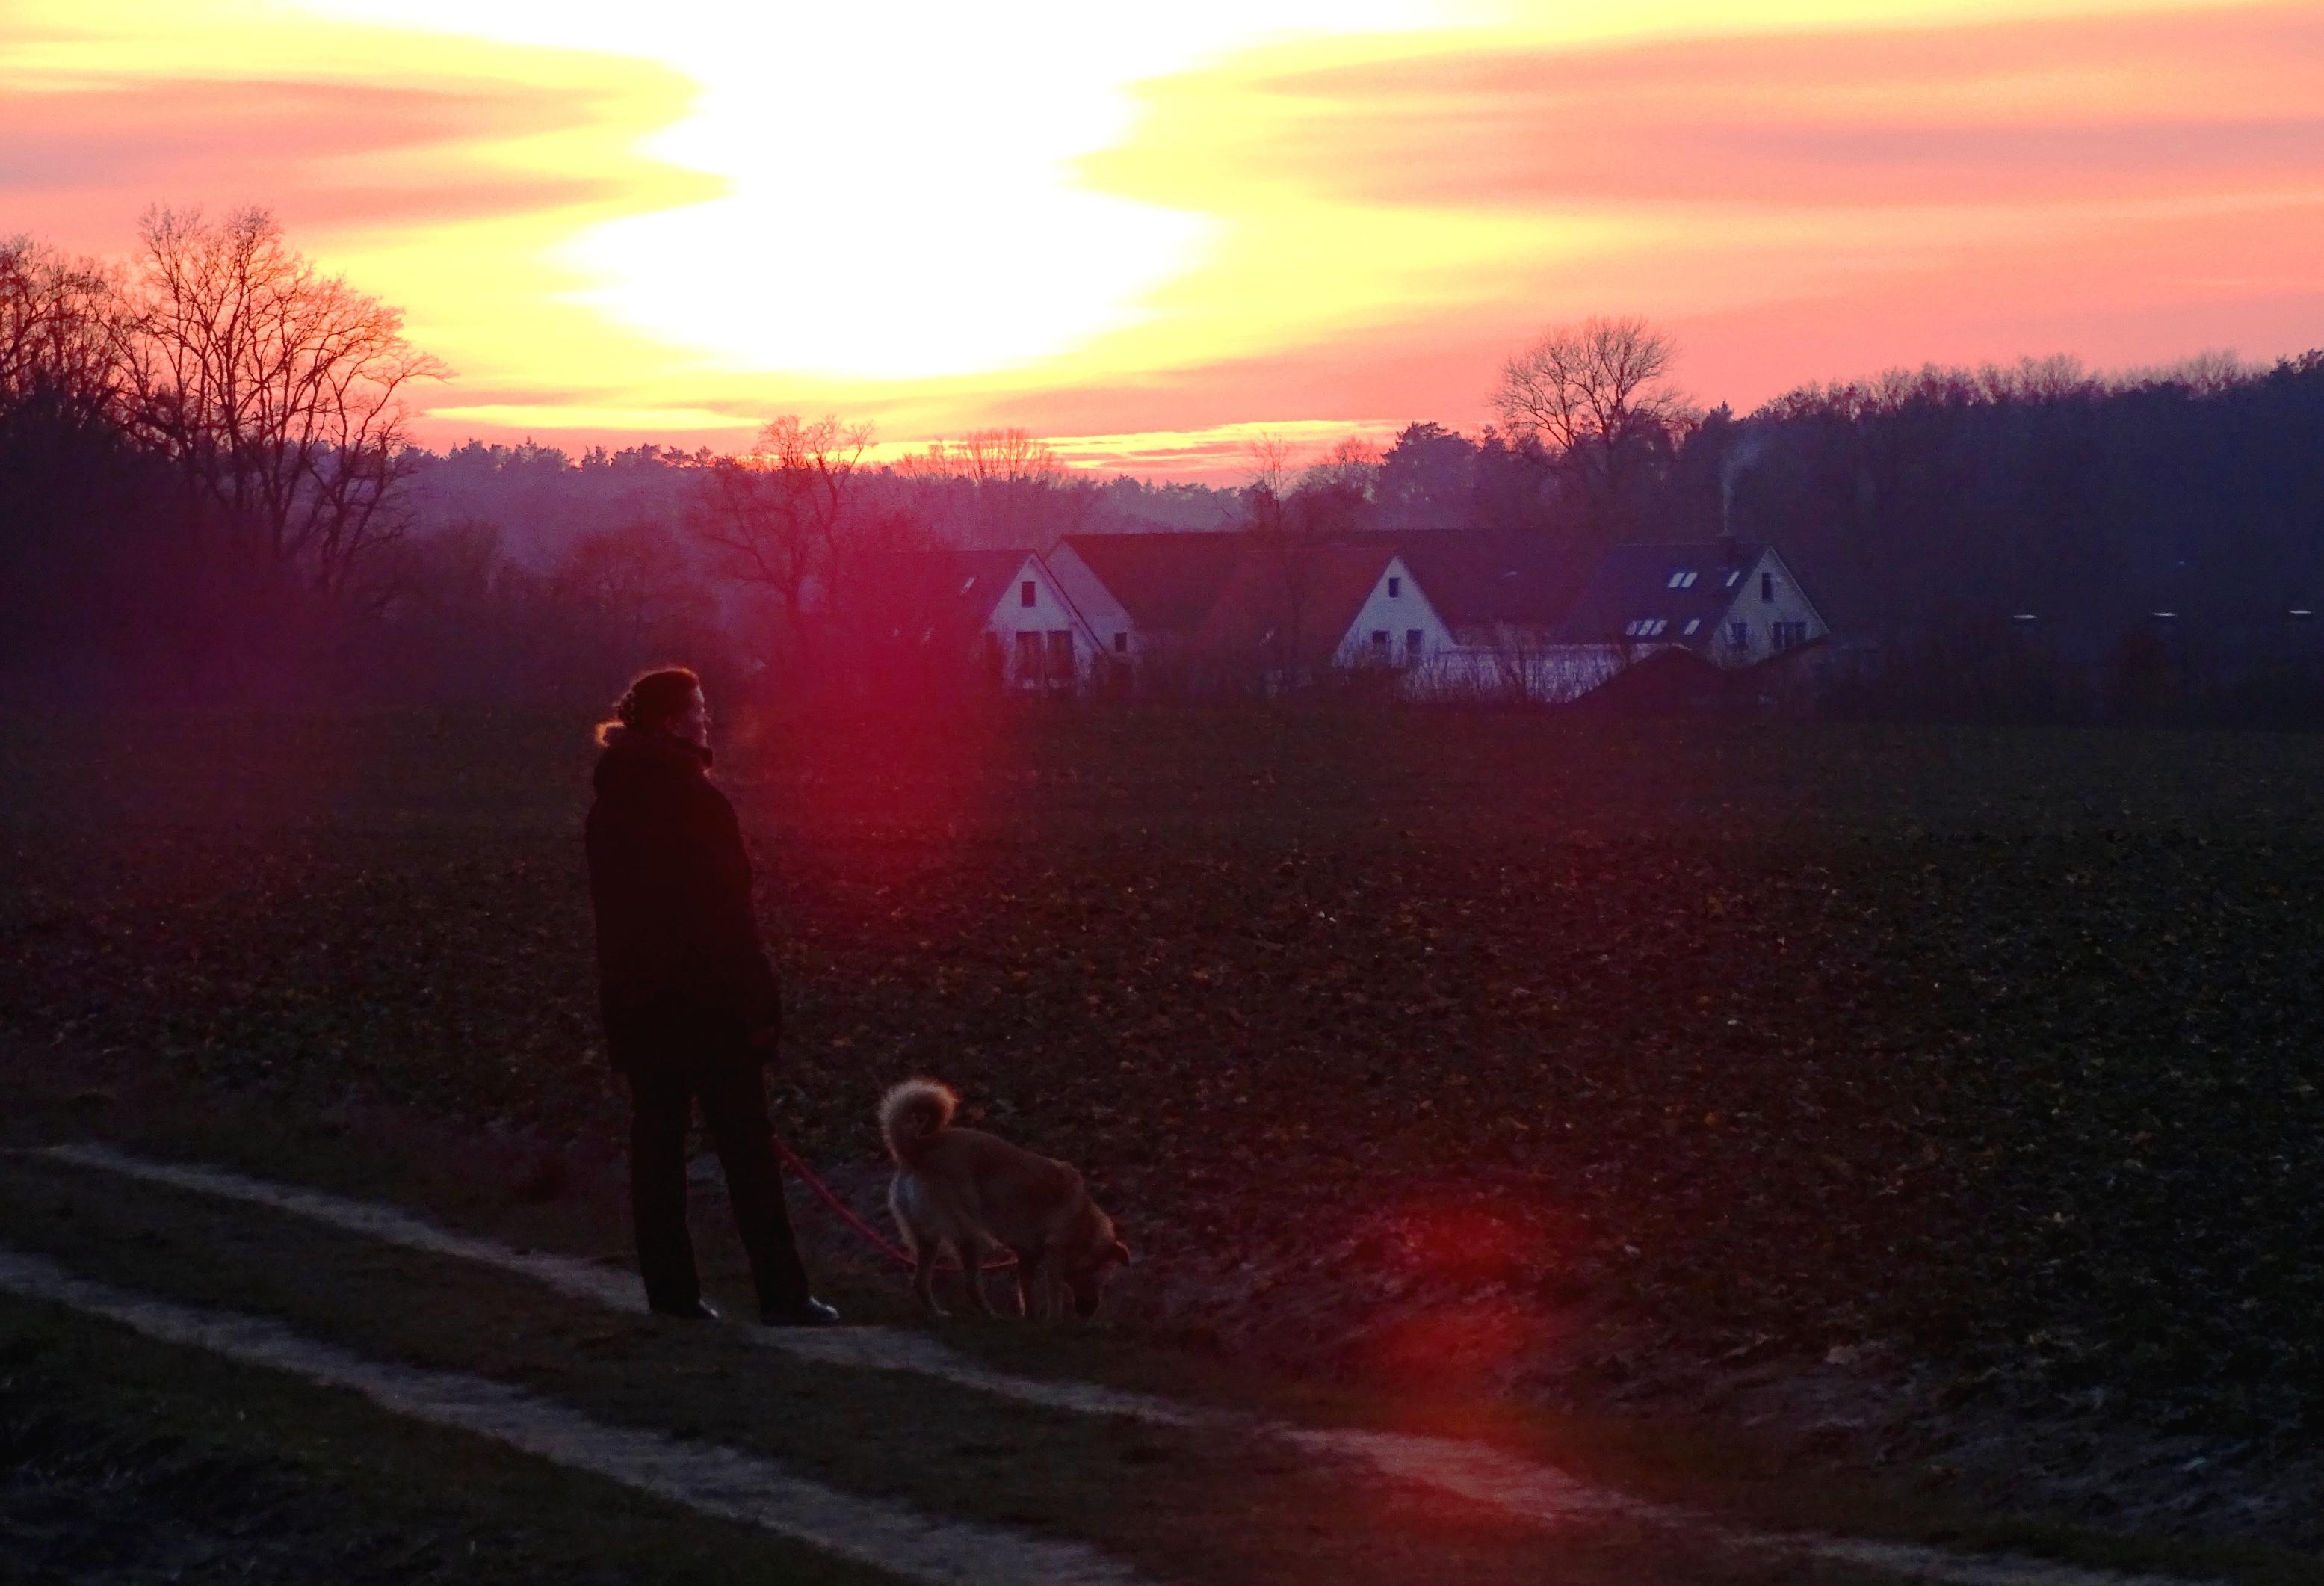 Cane al tramonto - Foto Guido Comin PoetaMatusèl